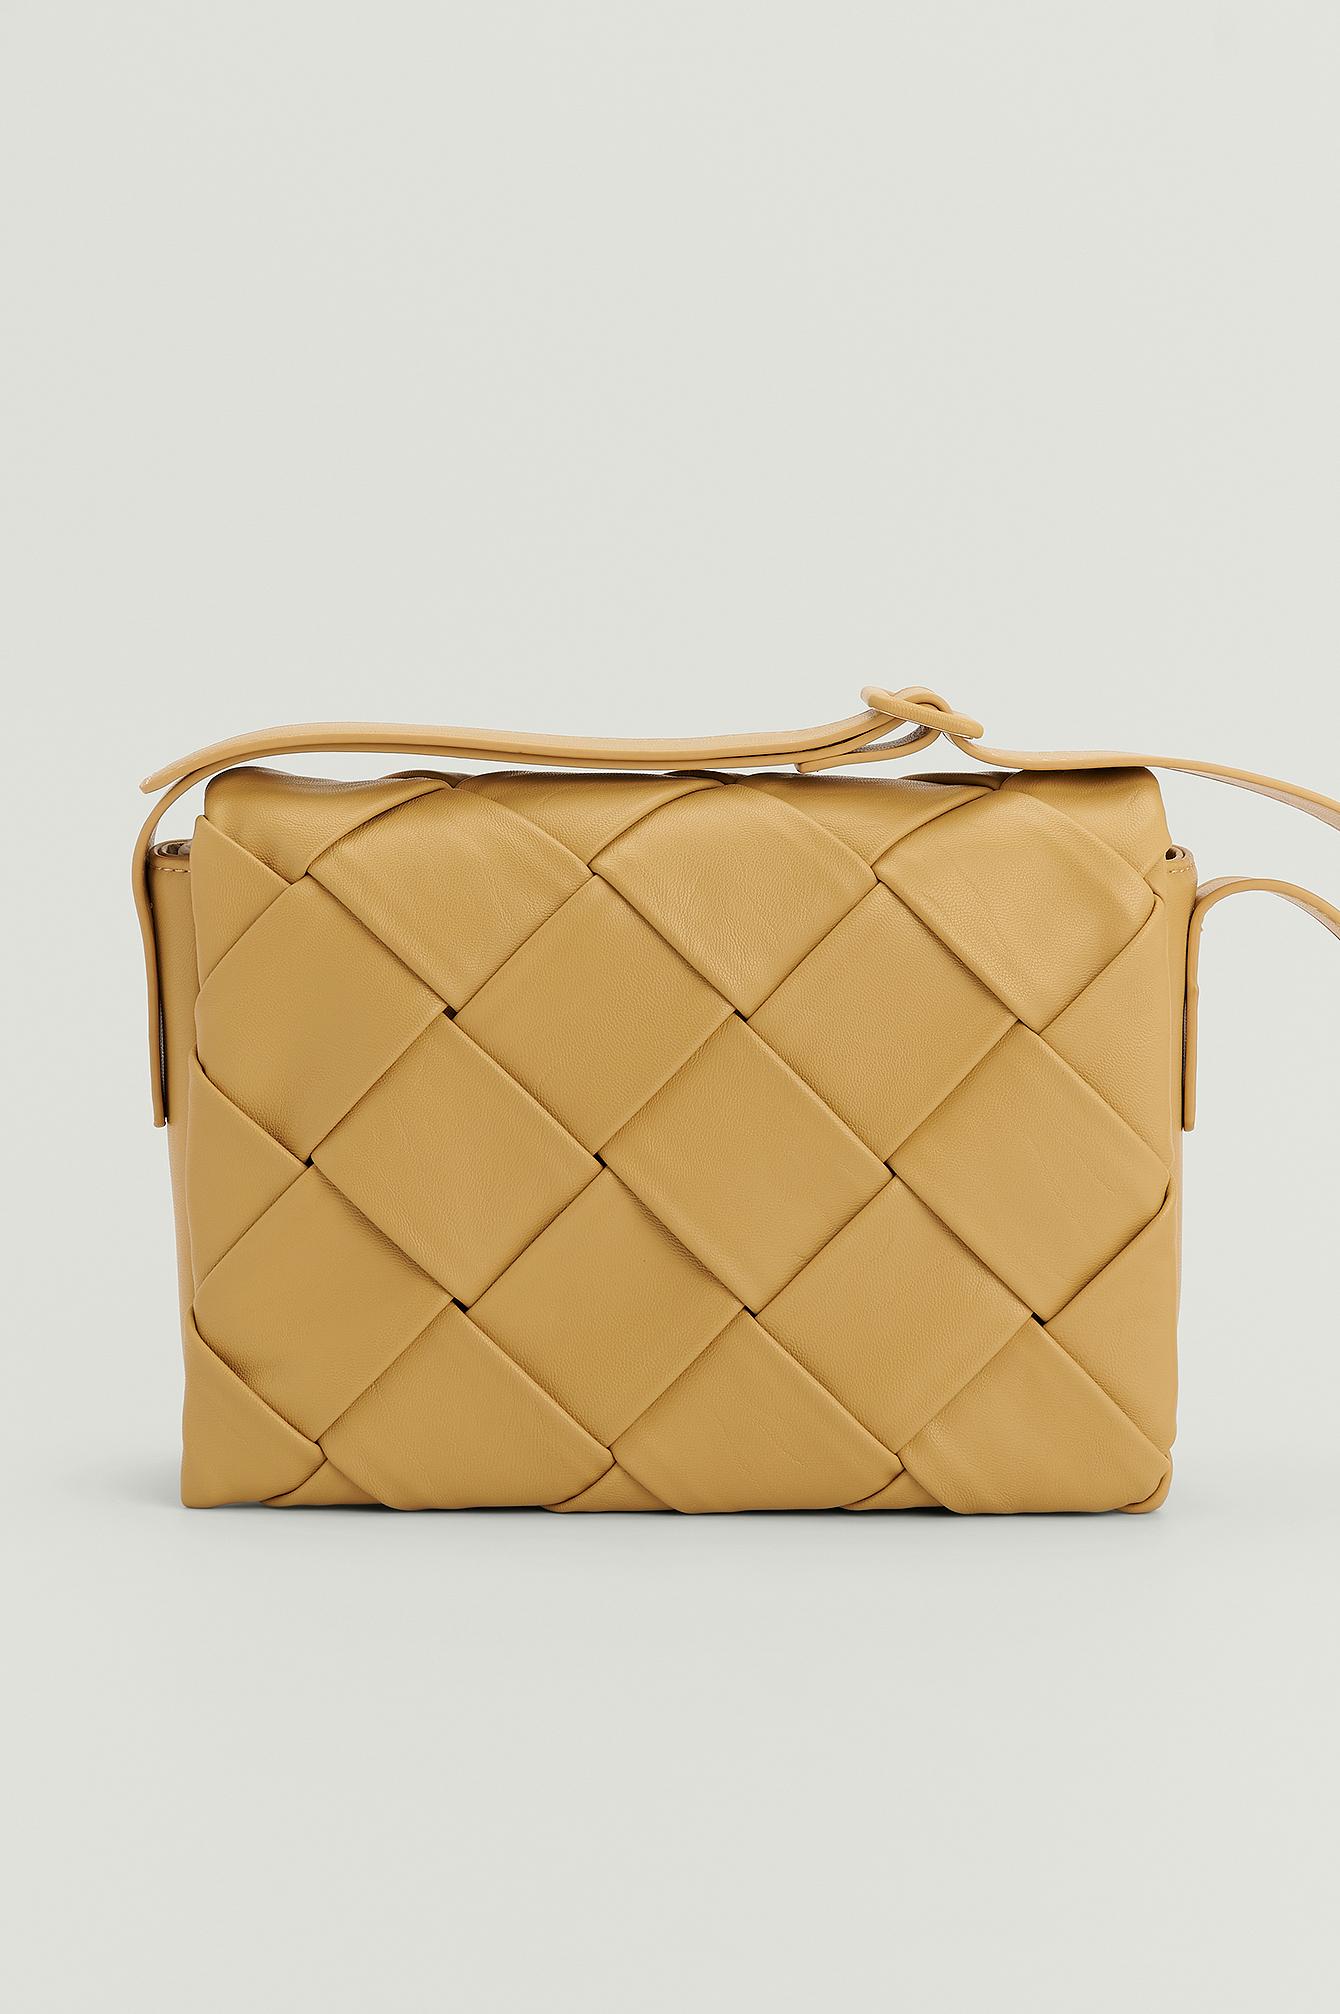 NA-KD Accessories Vevd Crossbody Bag - Yellow